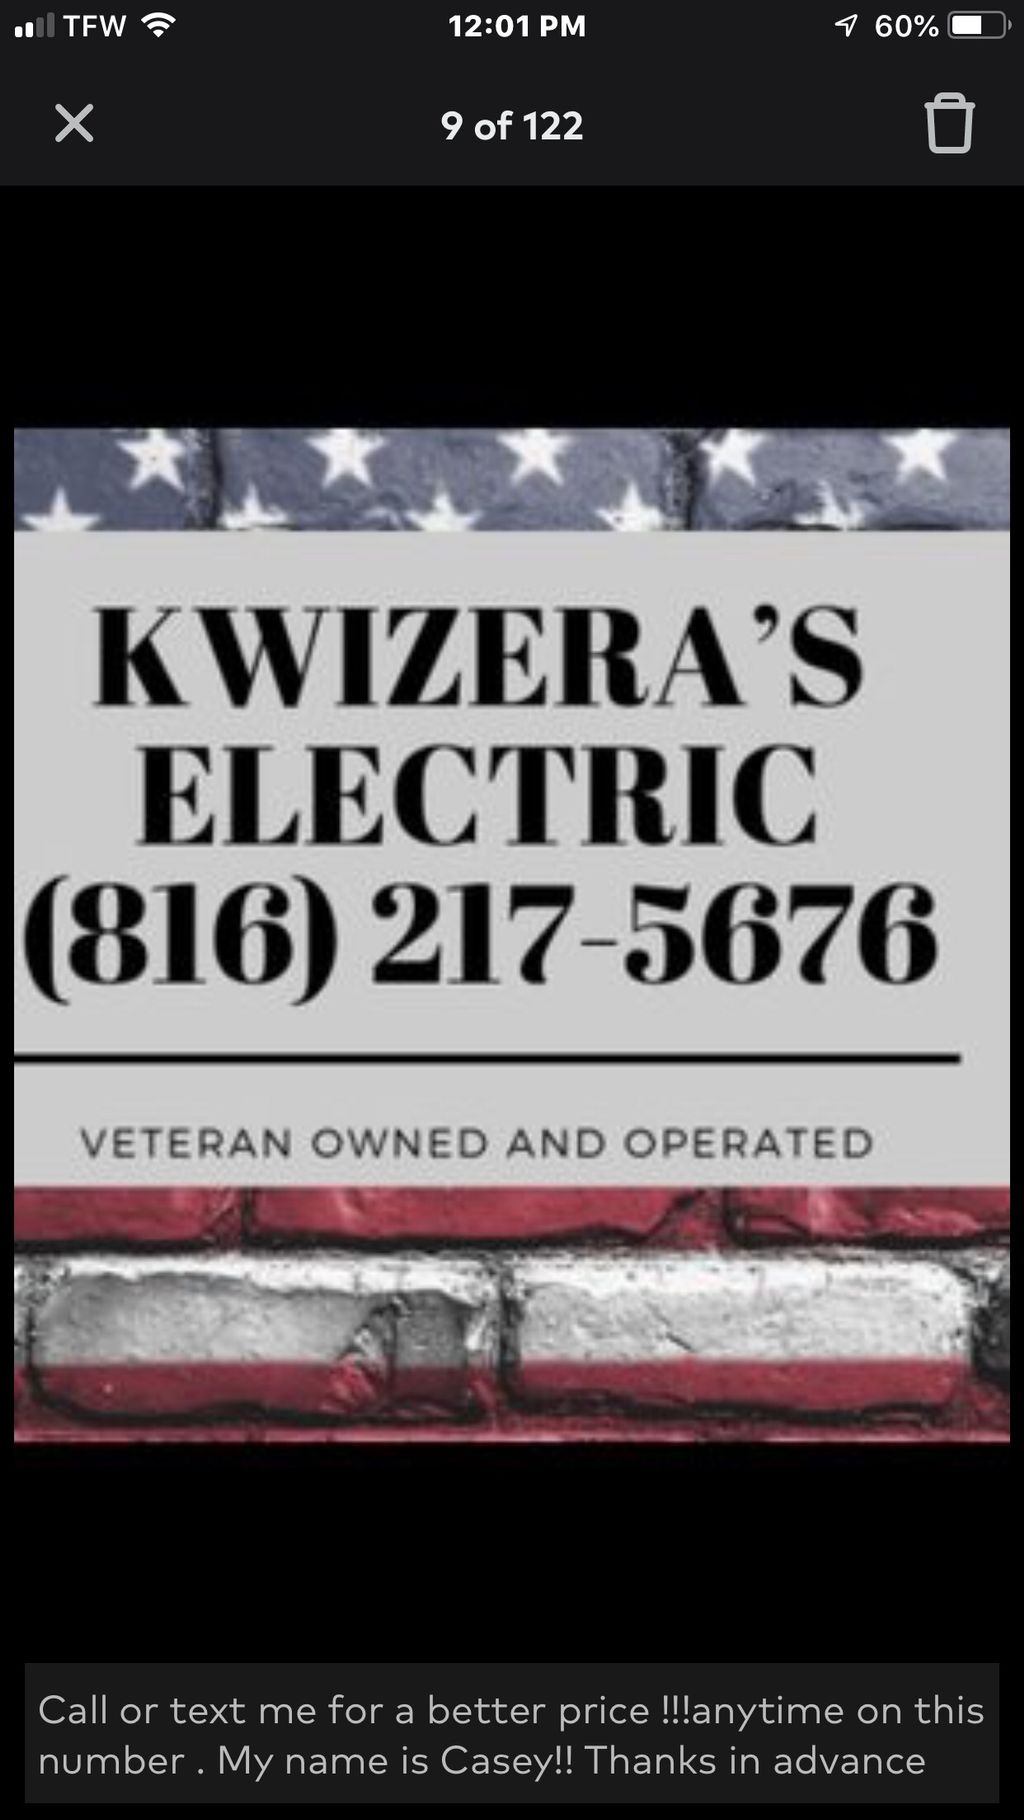 Kwizera's Electric LLC